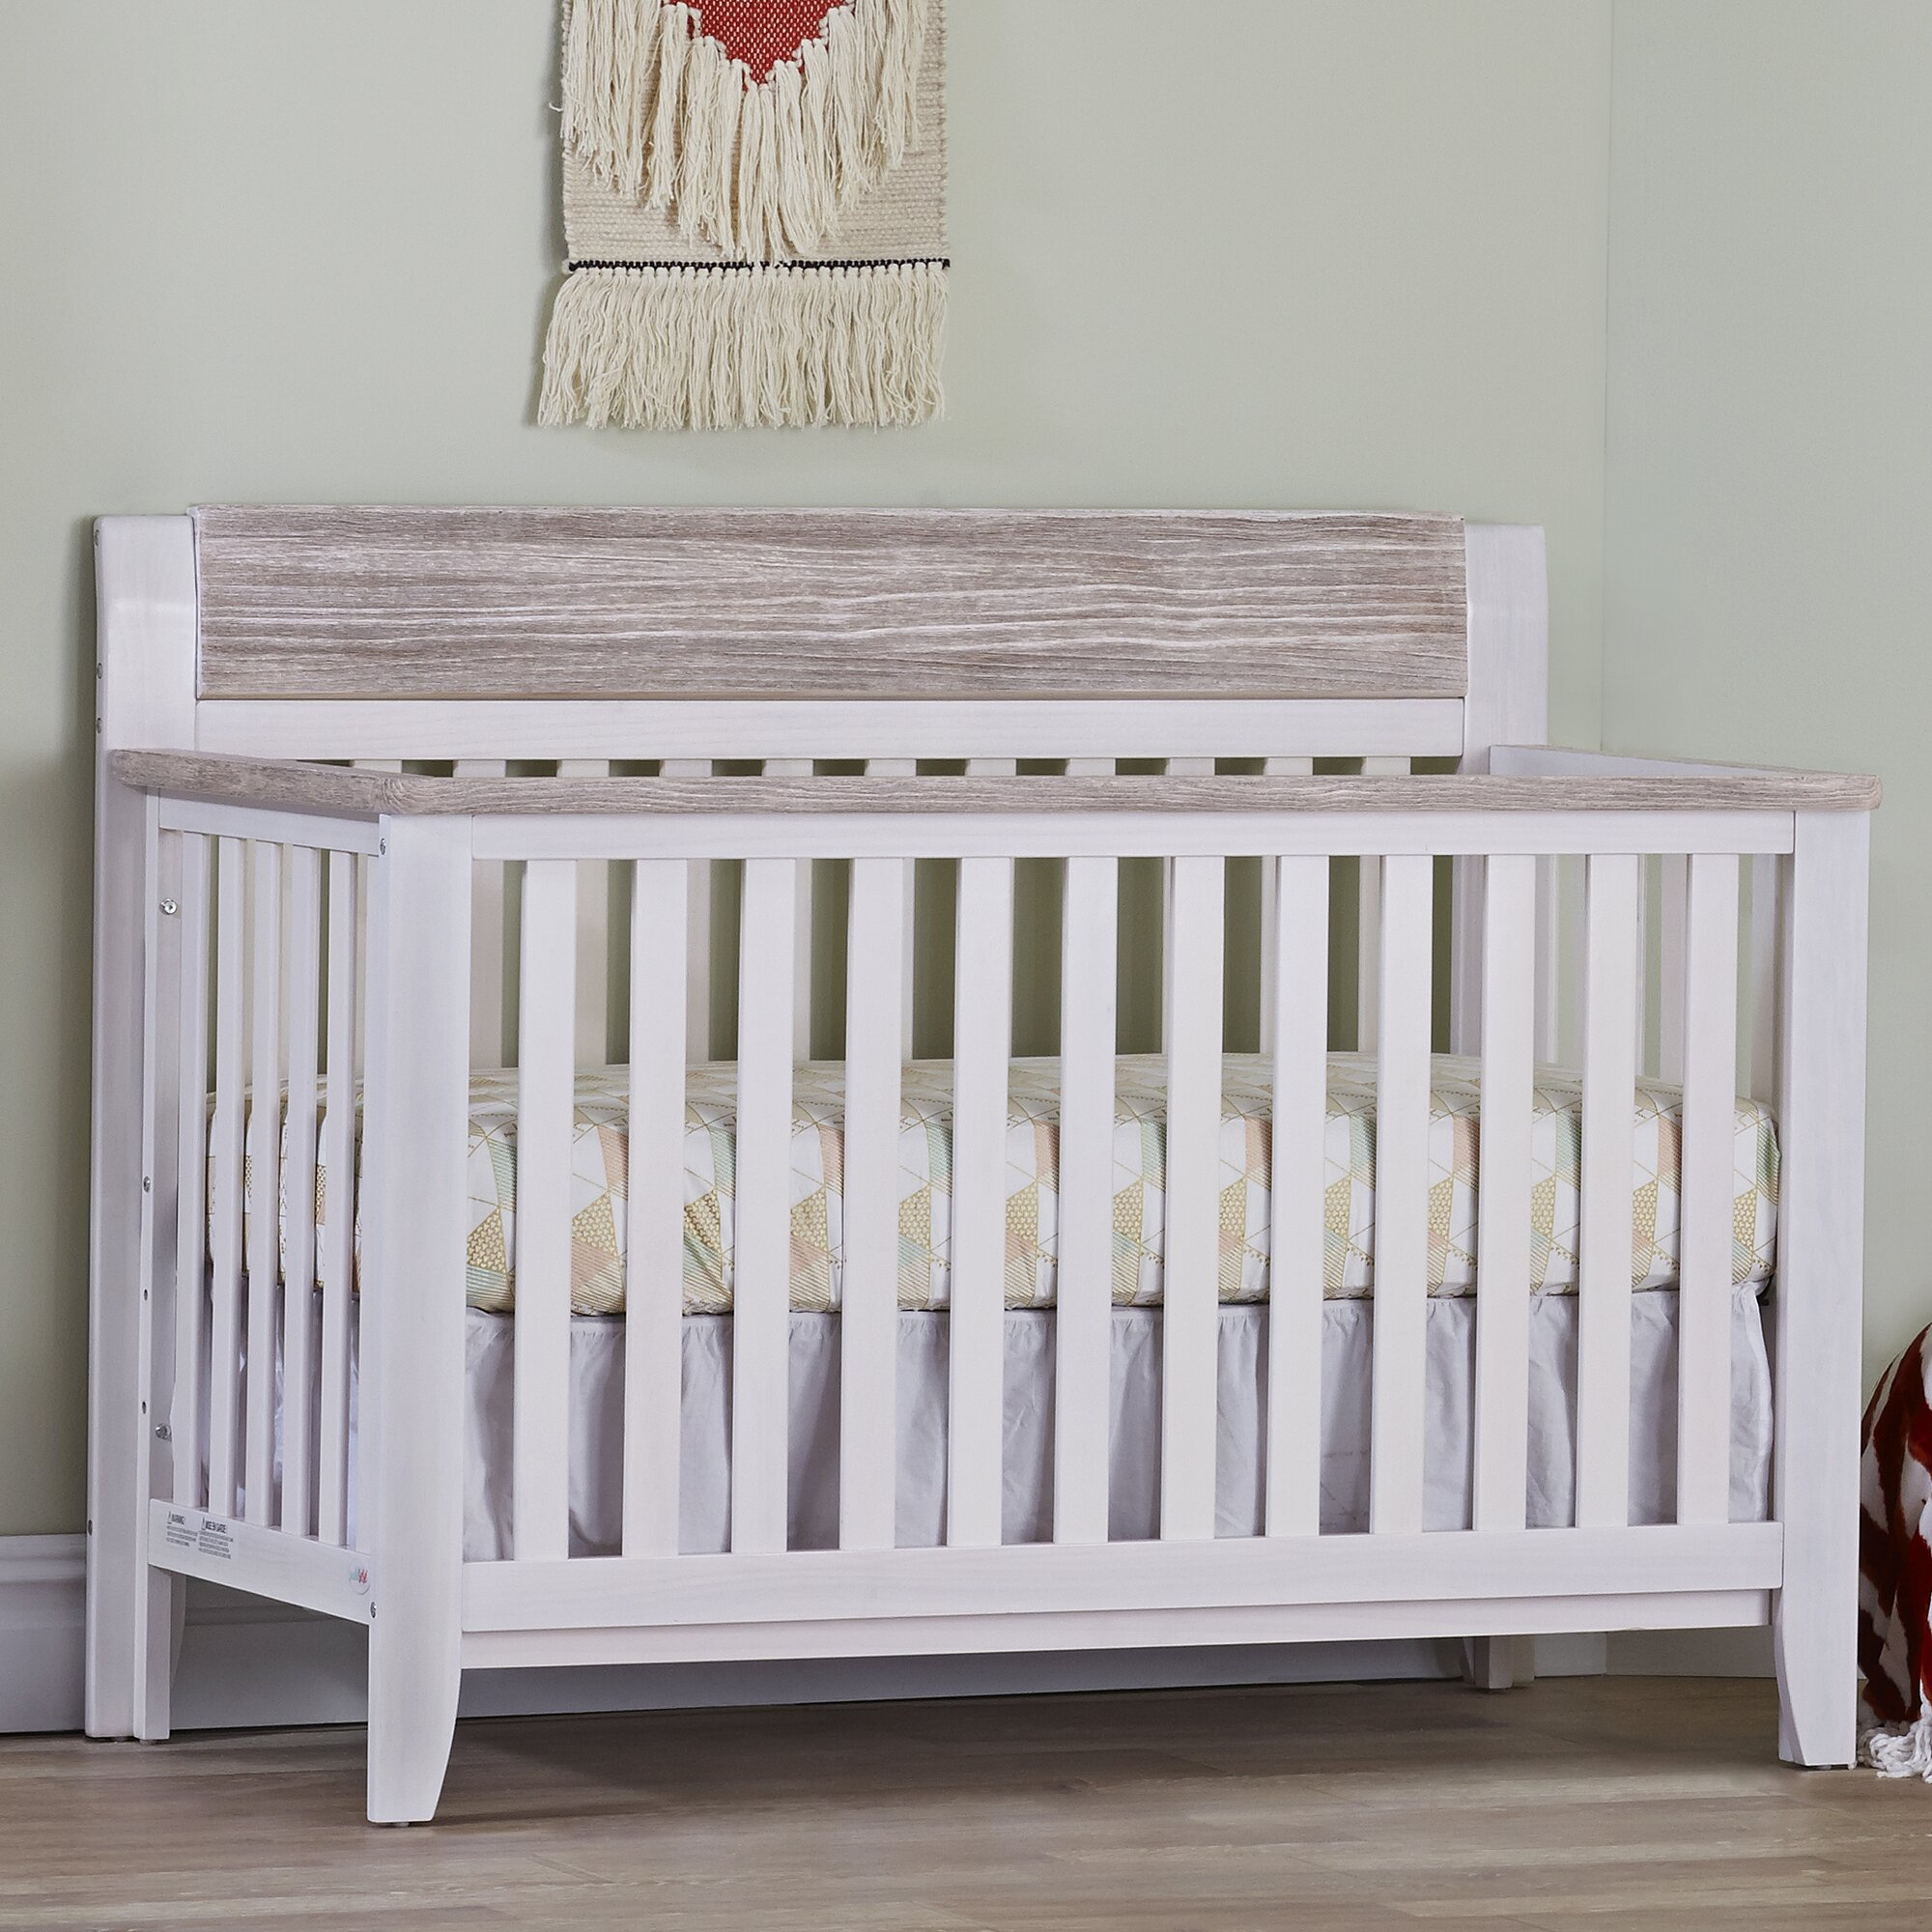 Suite Bebe Hayes Lifetime 4 In 1 Convertible Crib